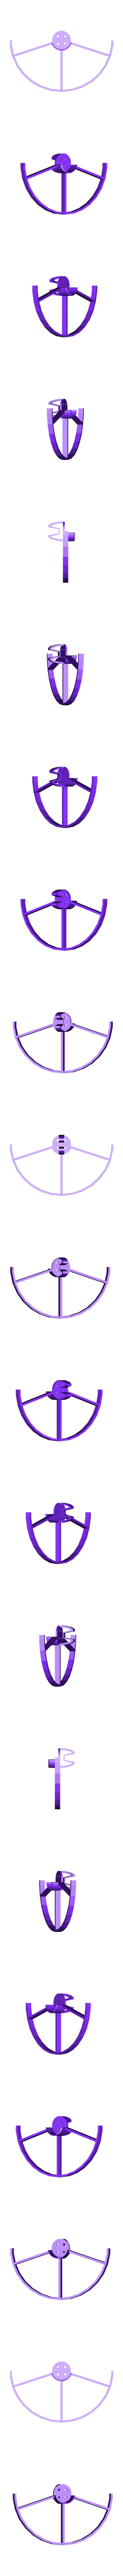 Protege_V2.STL Download STL file Walkera F210 propeller guard • 3D printer object, Minkus